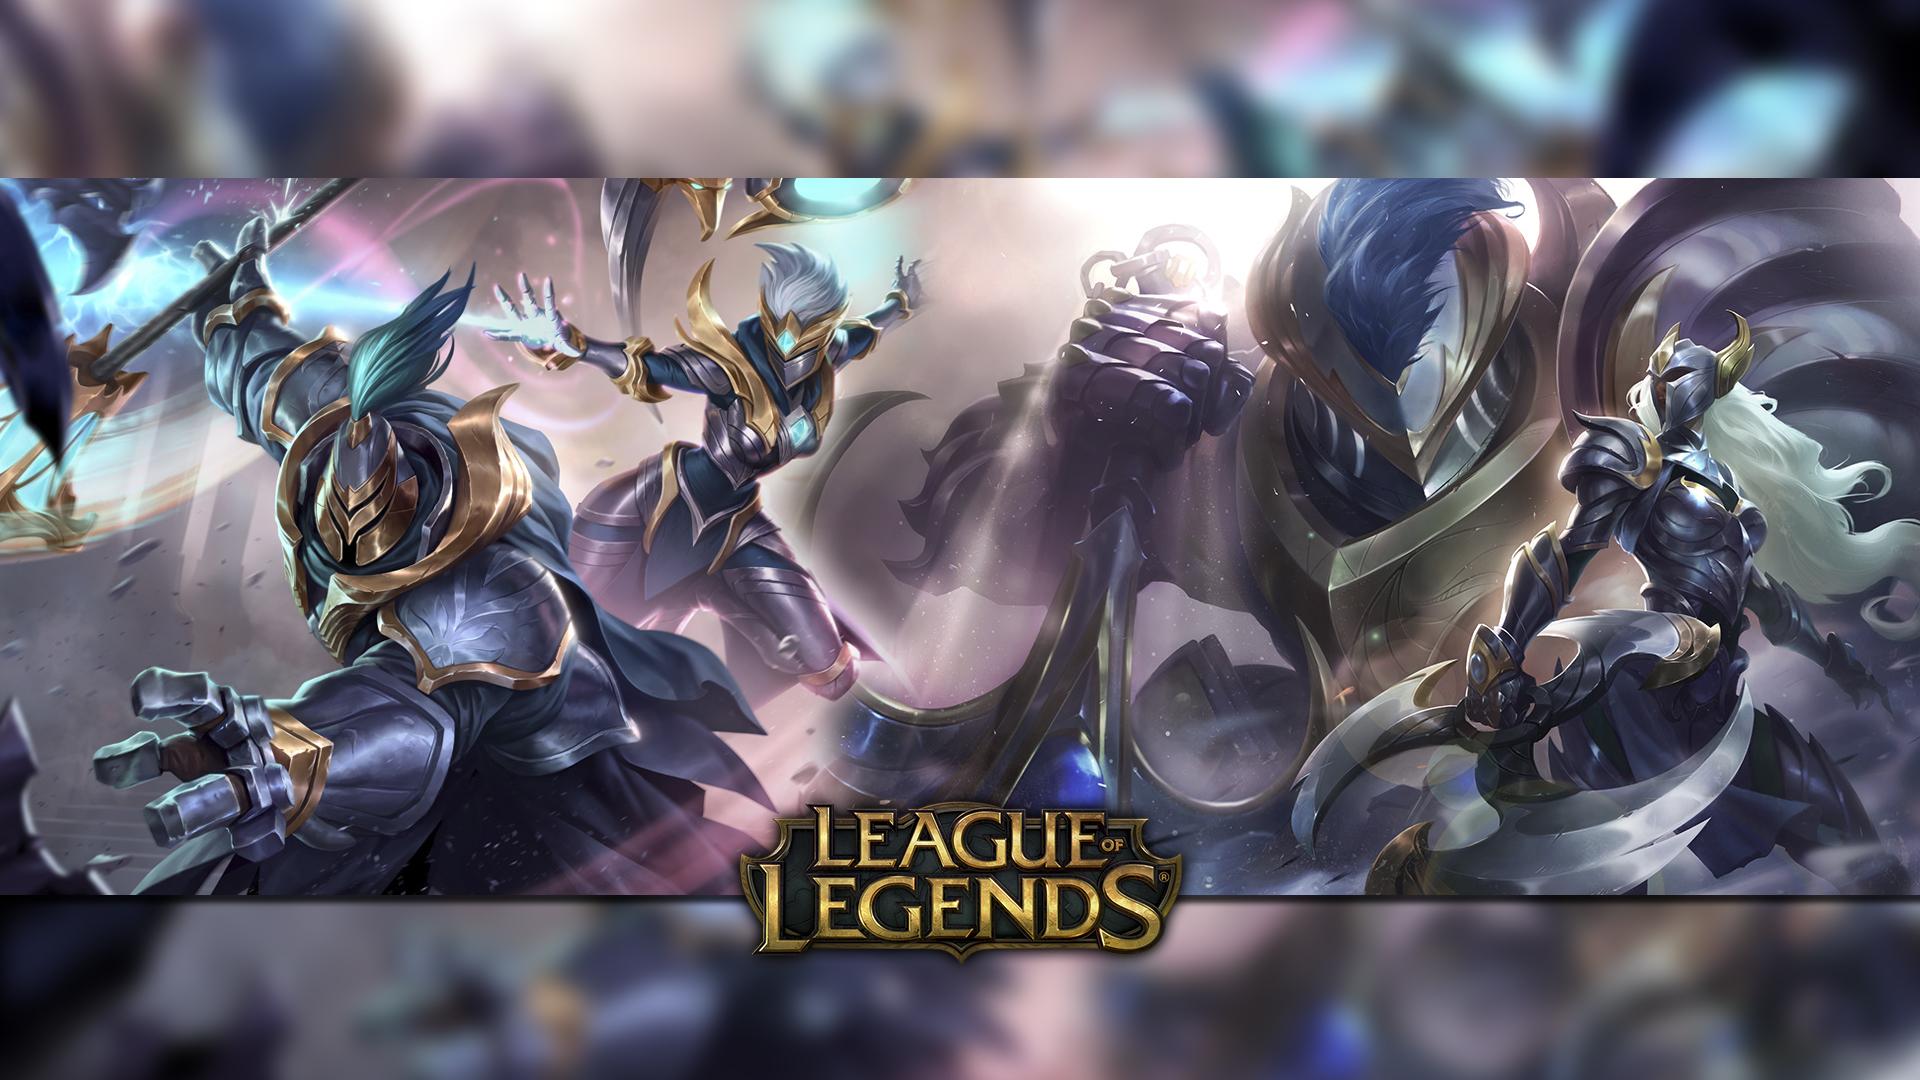 league of legends sivir  № 3347843 загрузить